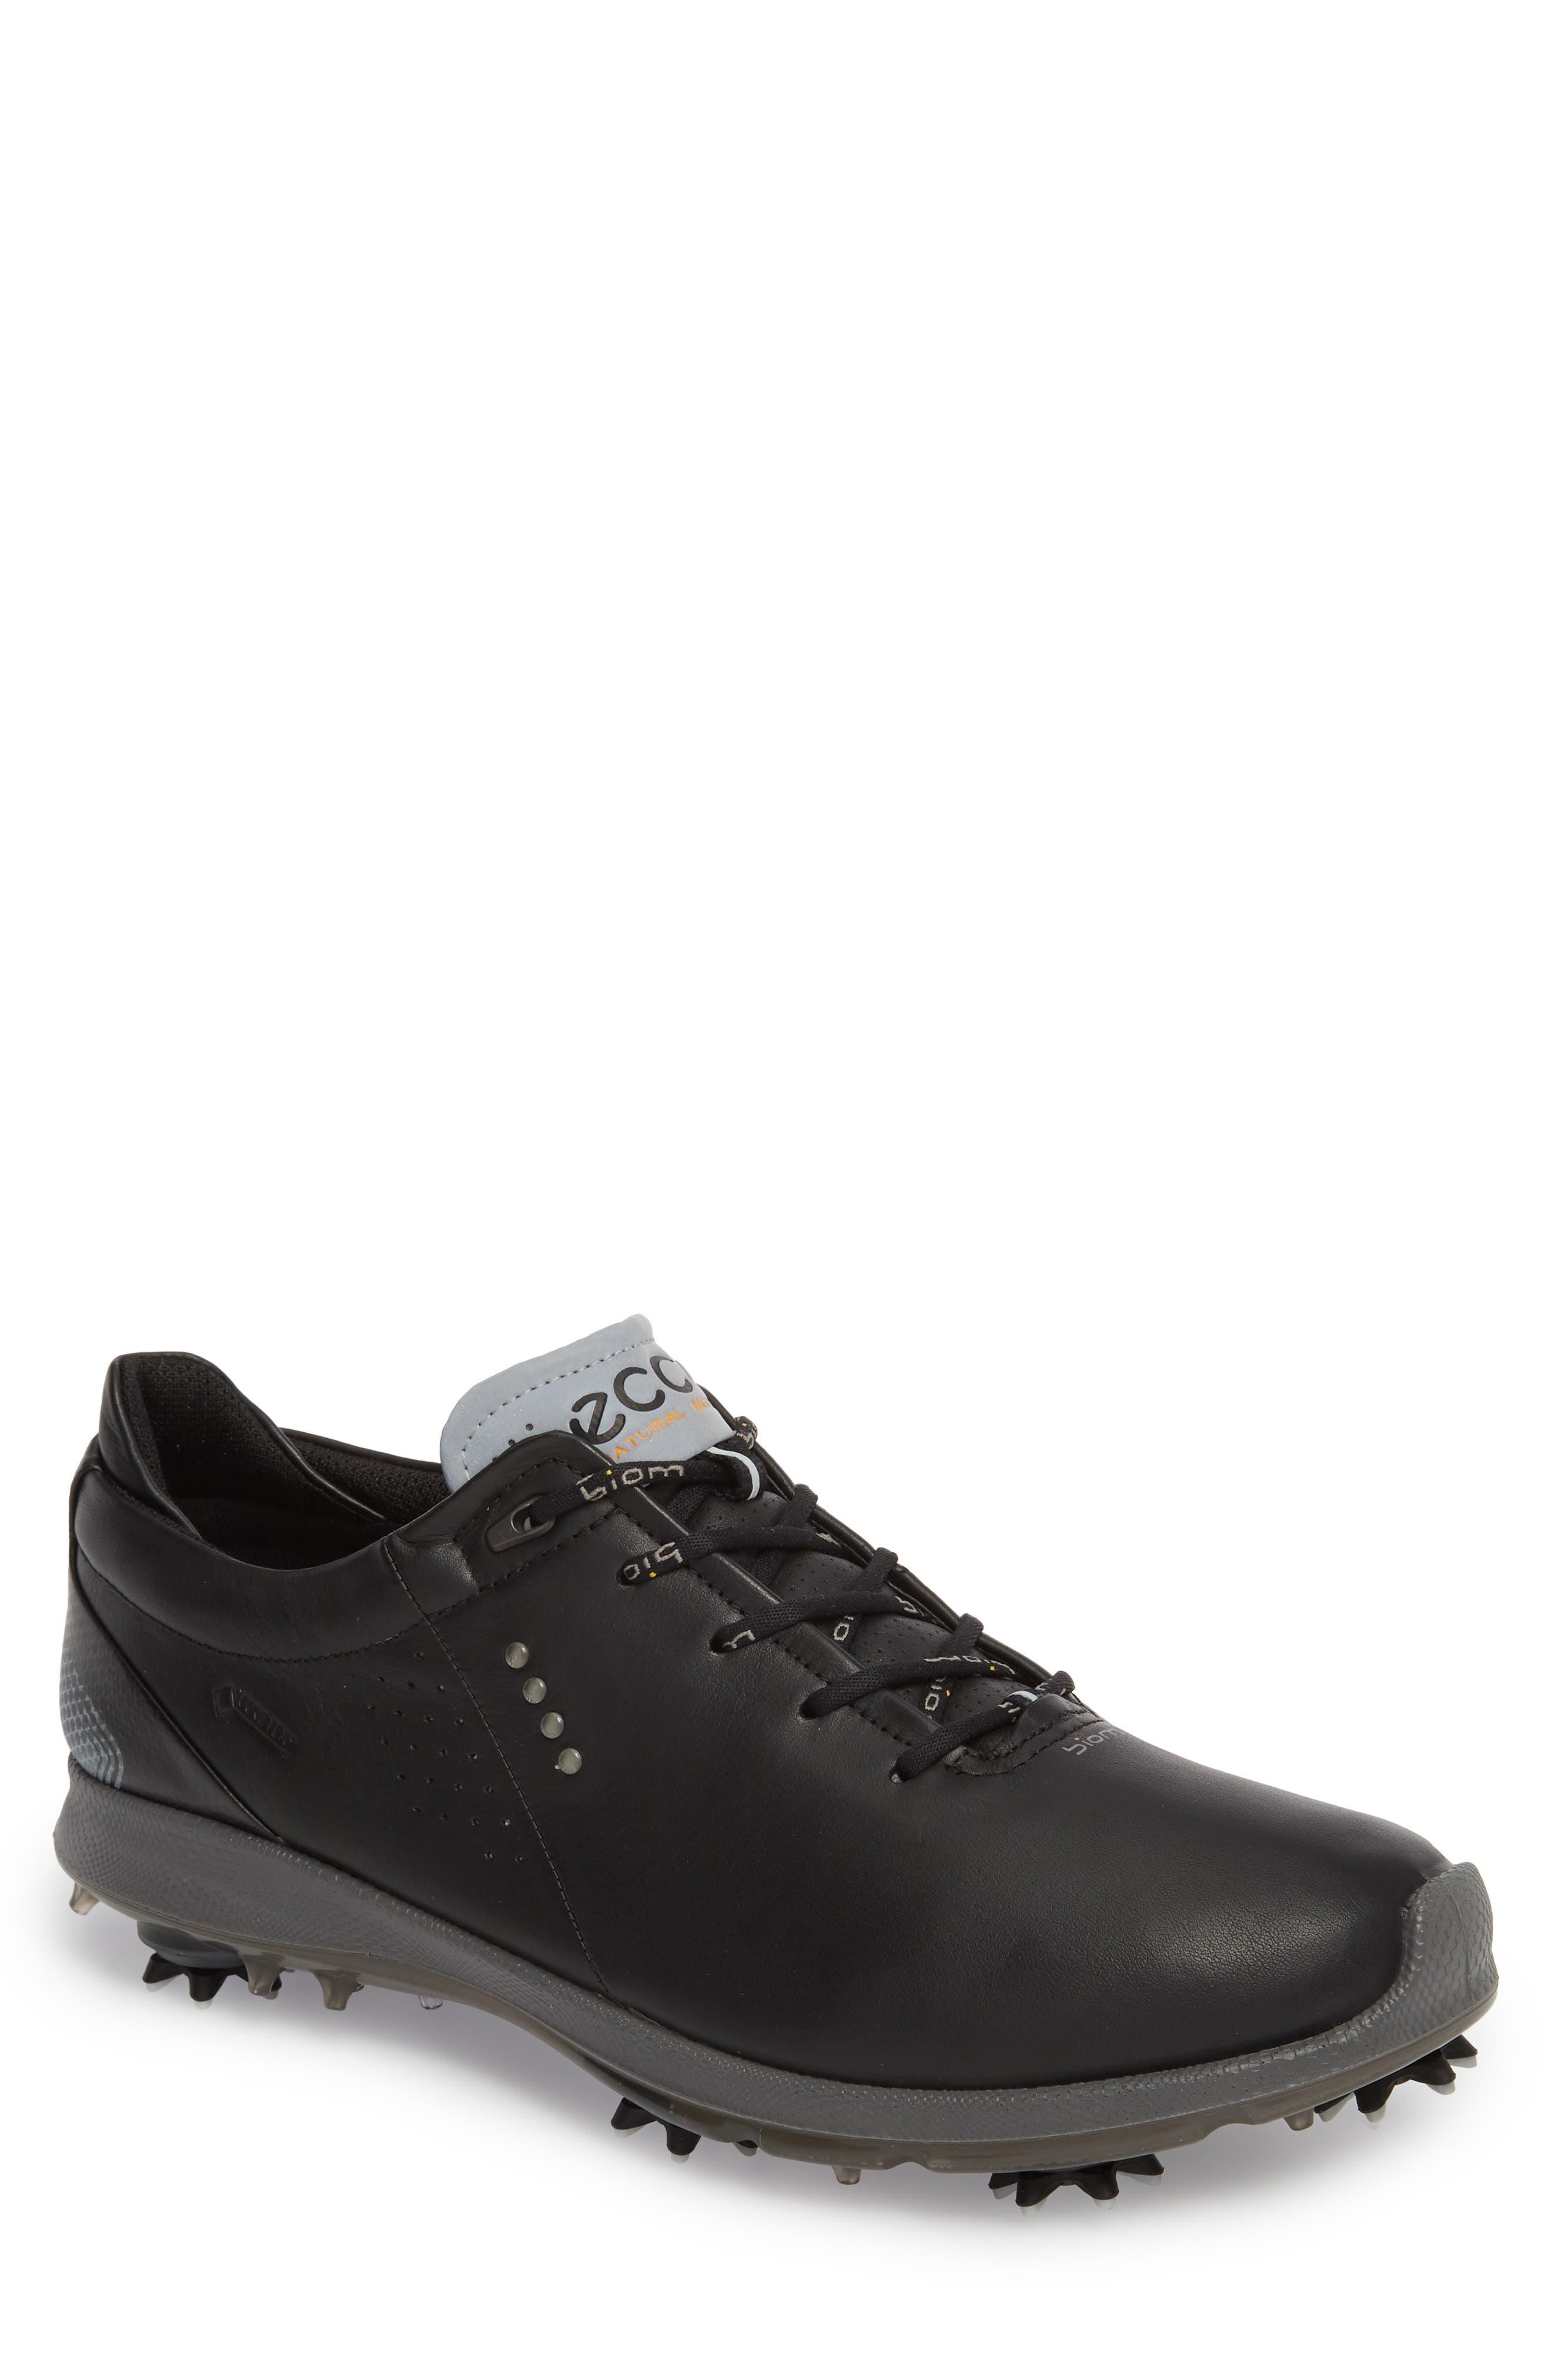 BIOM G 2 Free Gore-Tex<sup>®</sup> Golf Shoe, Main, color, 001